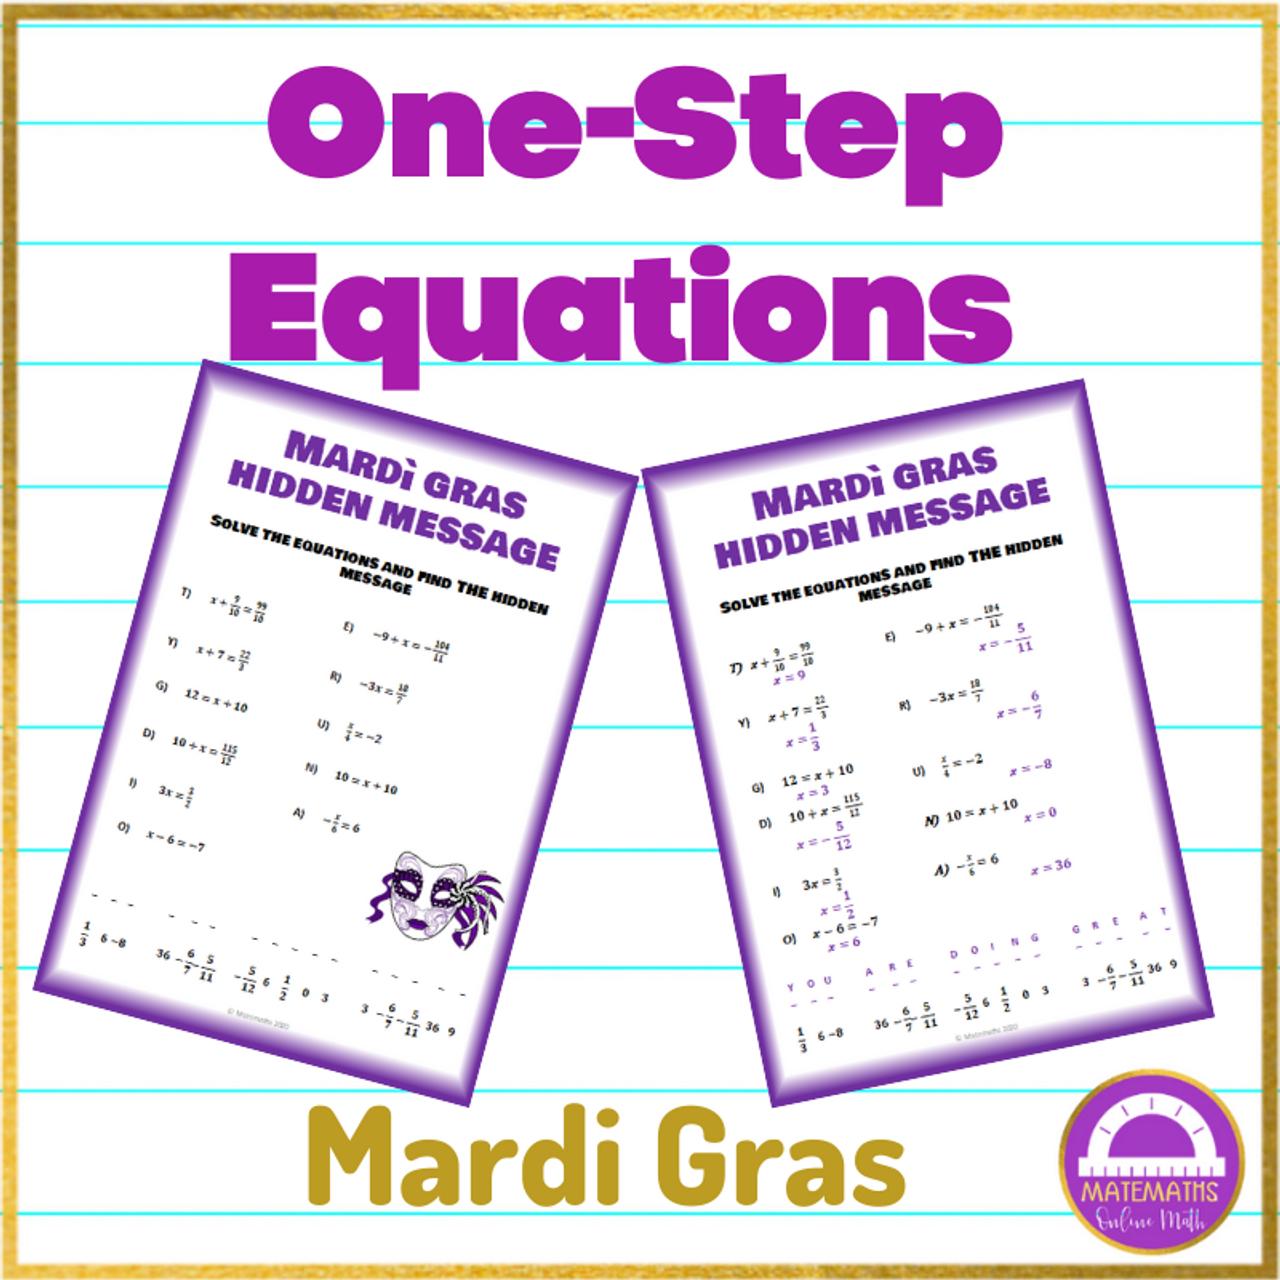 Mardi gras Algebra  One Step Equations Activity